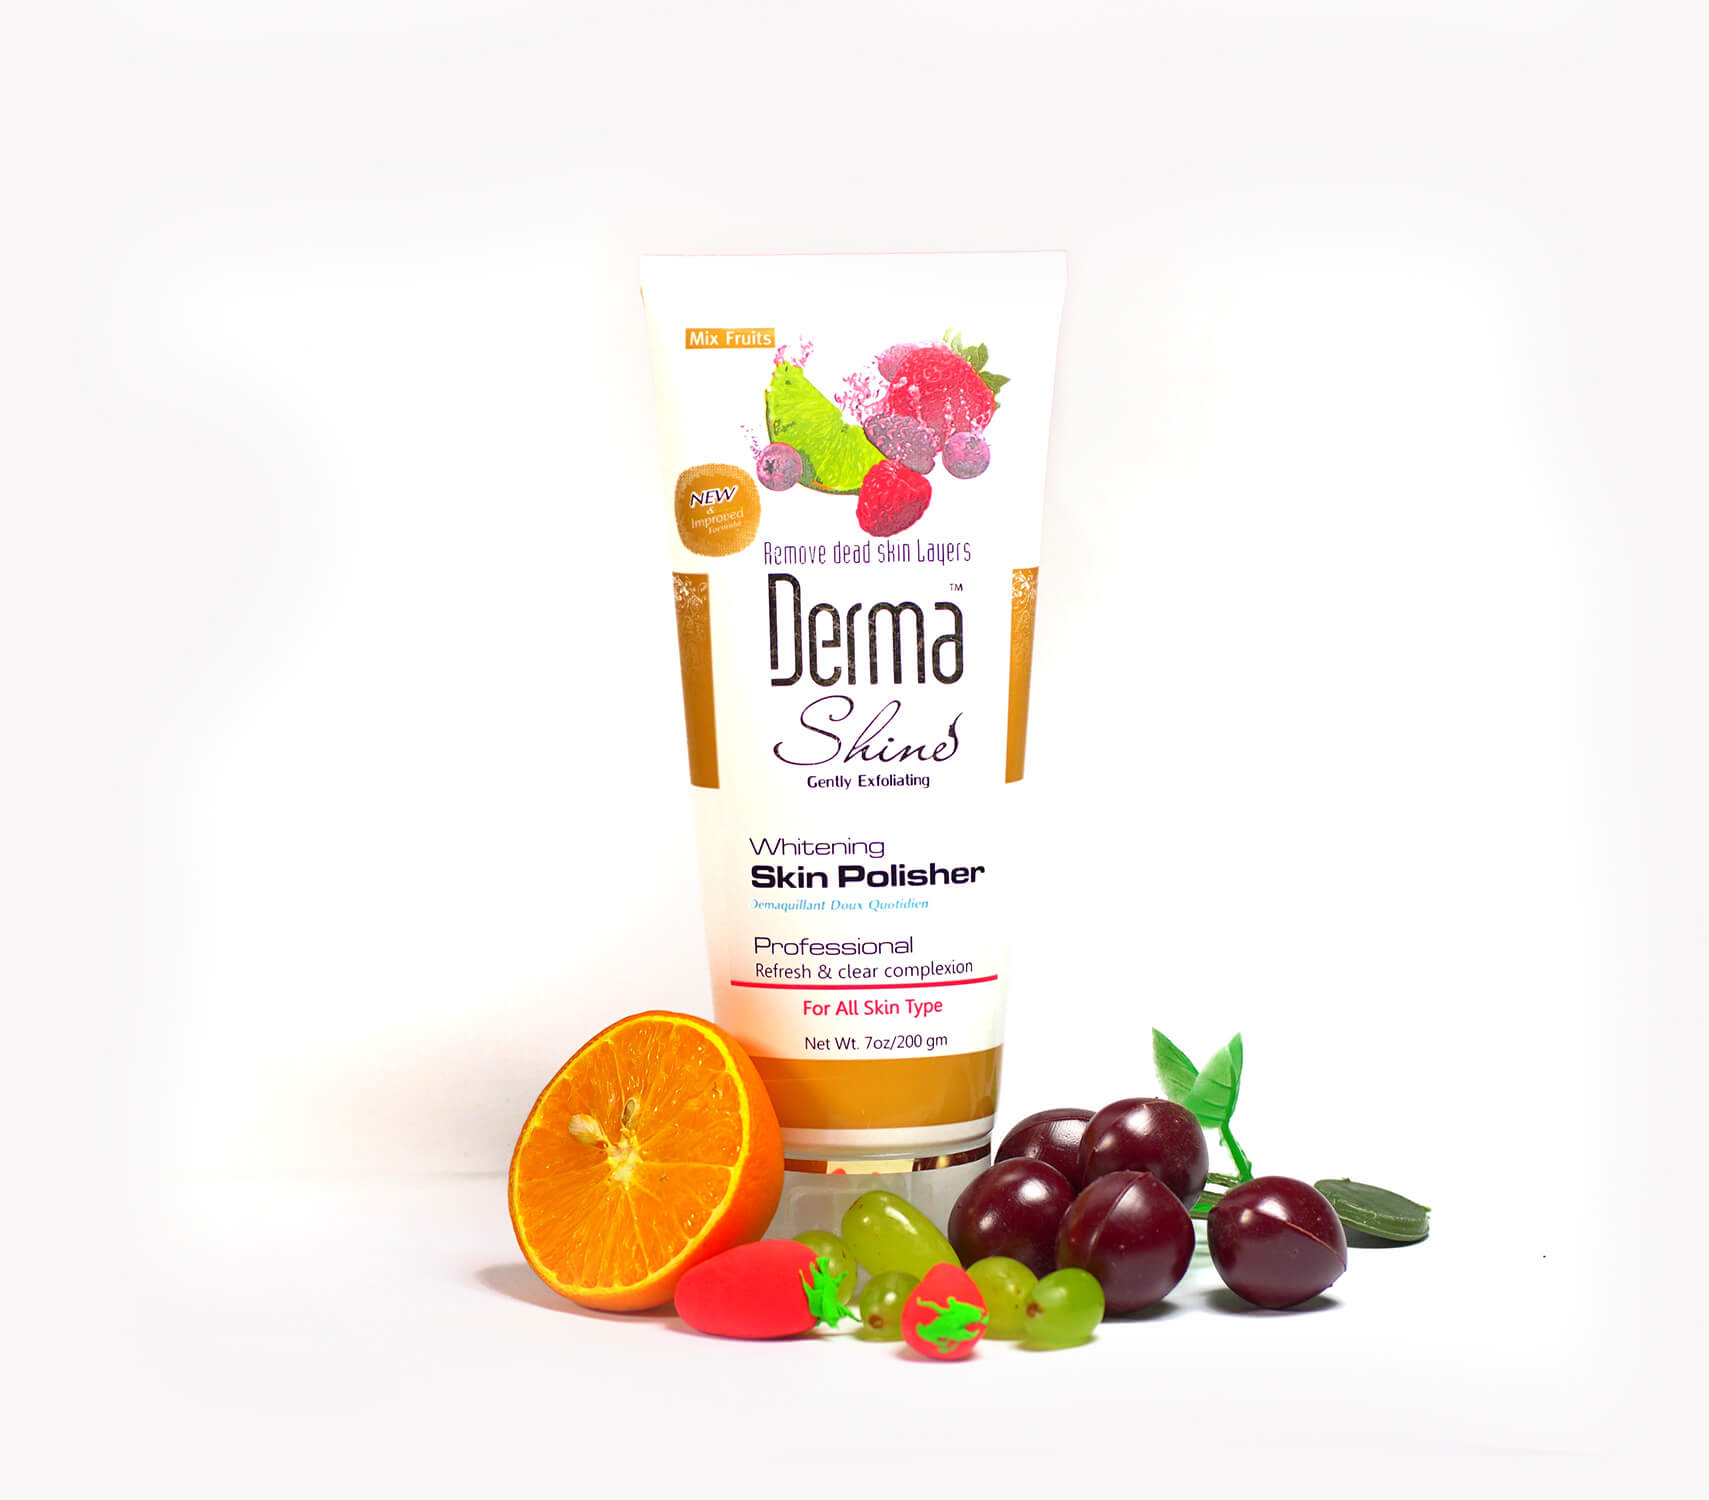 derma shine whitening scrub review sanwarna.pk